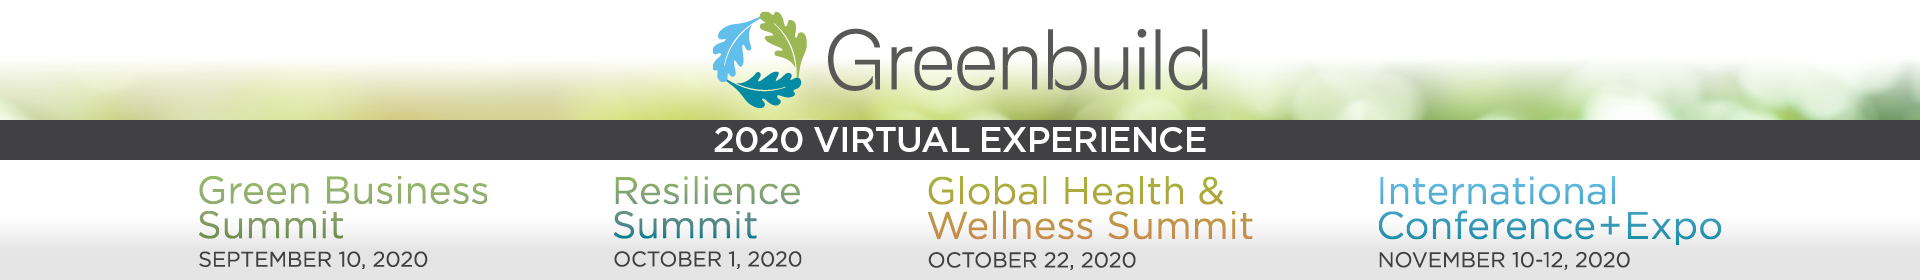 Greenbuild 2020 Event Banner